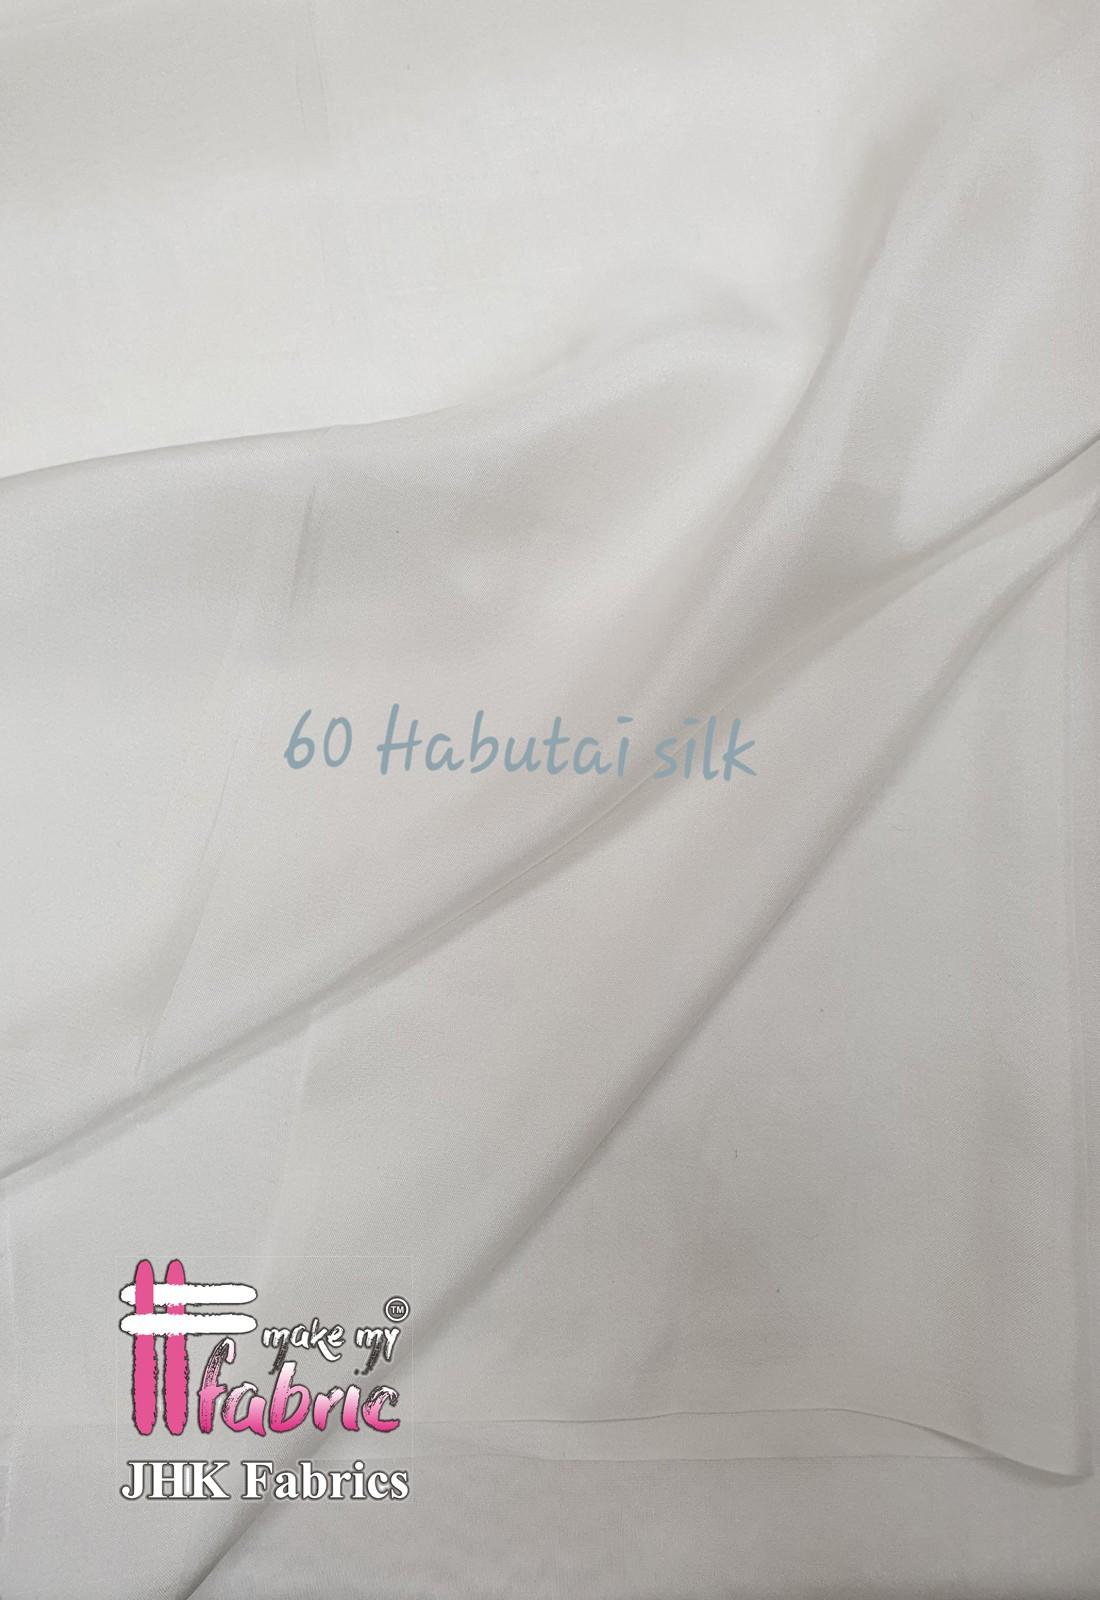 60 Habutai Silk